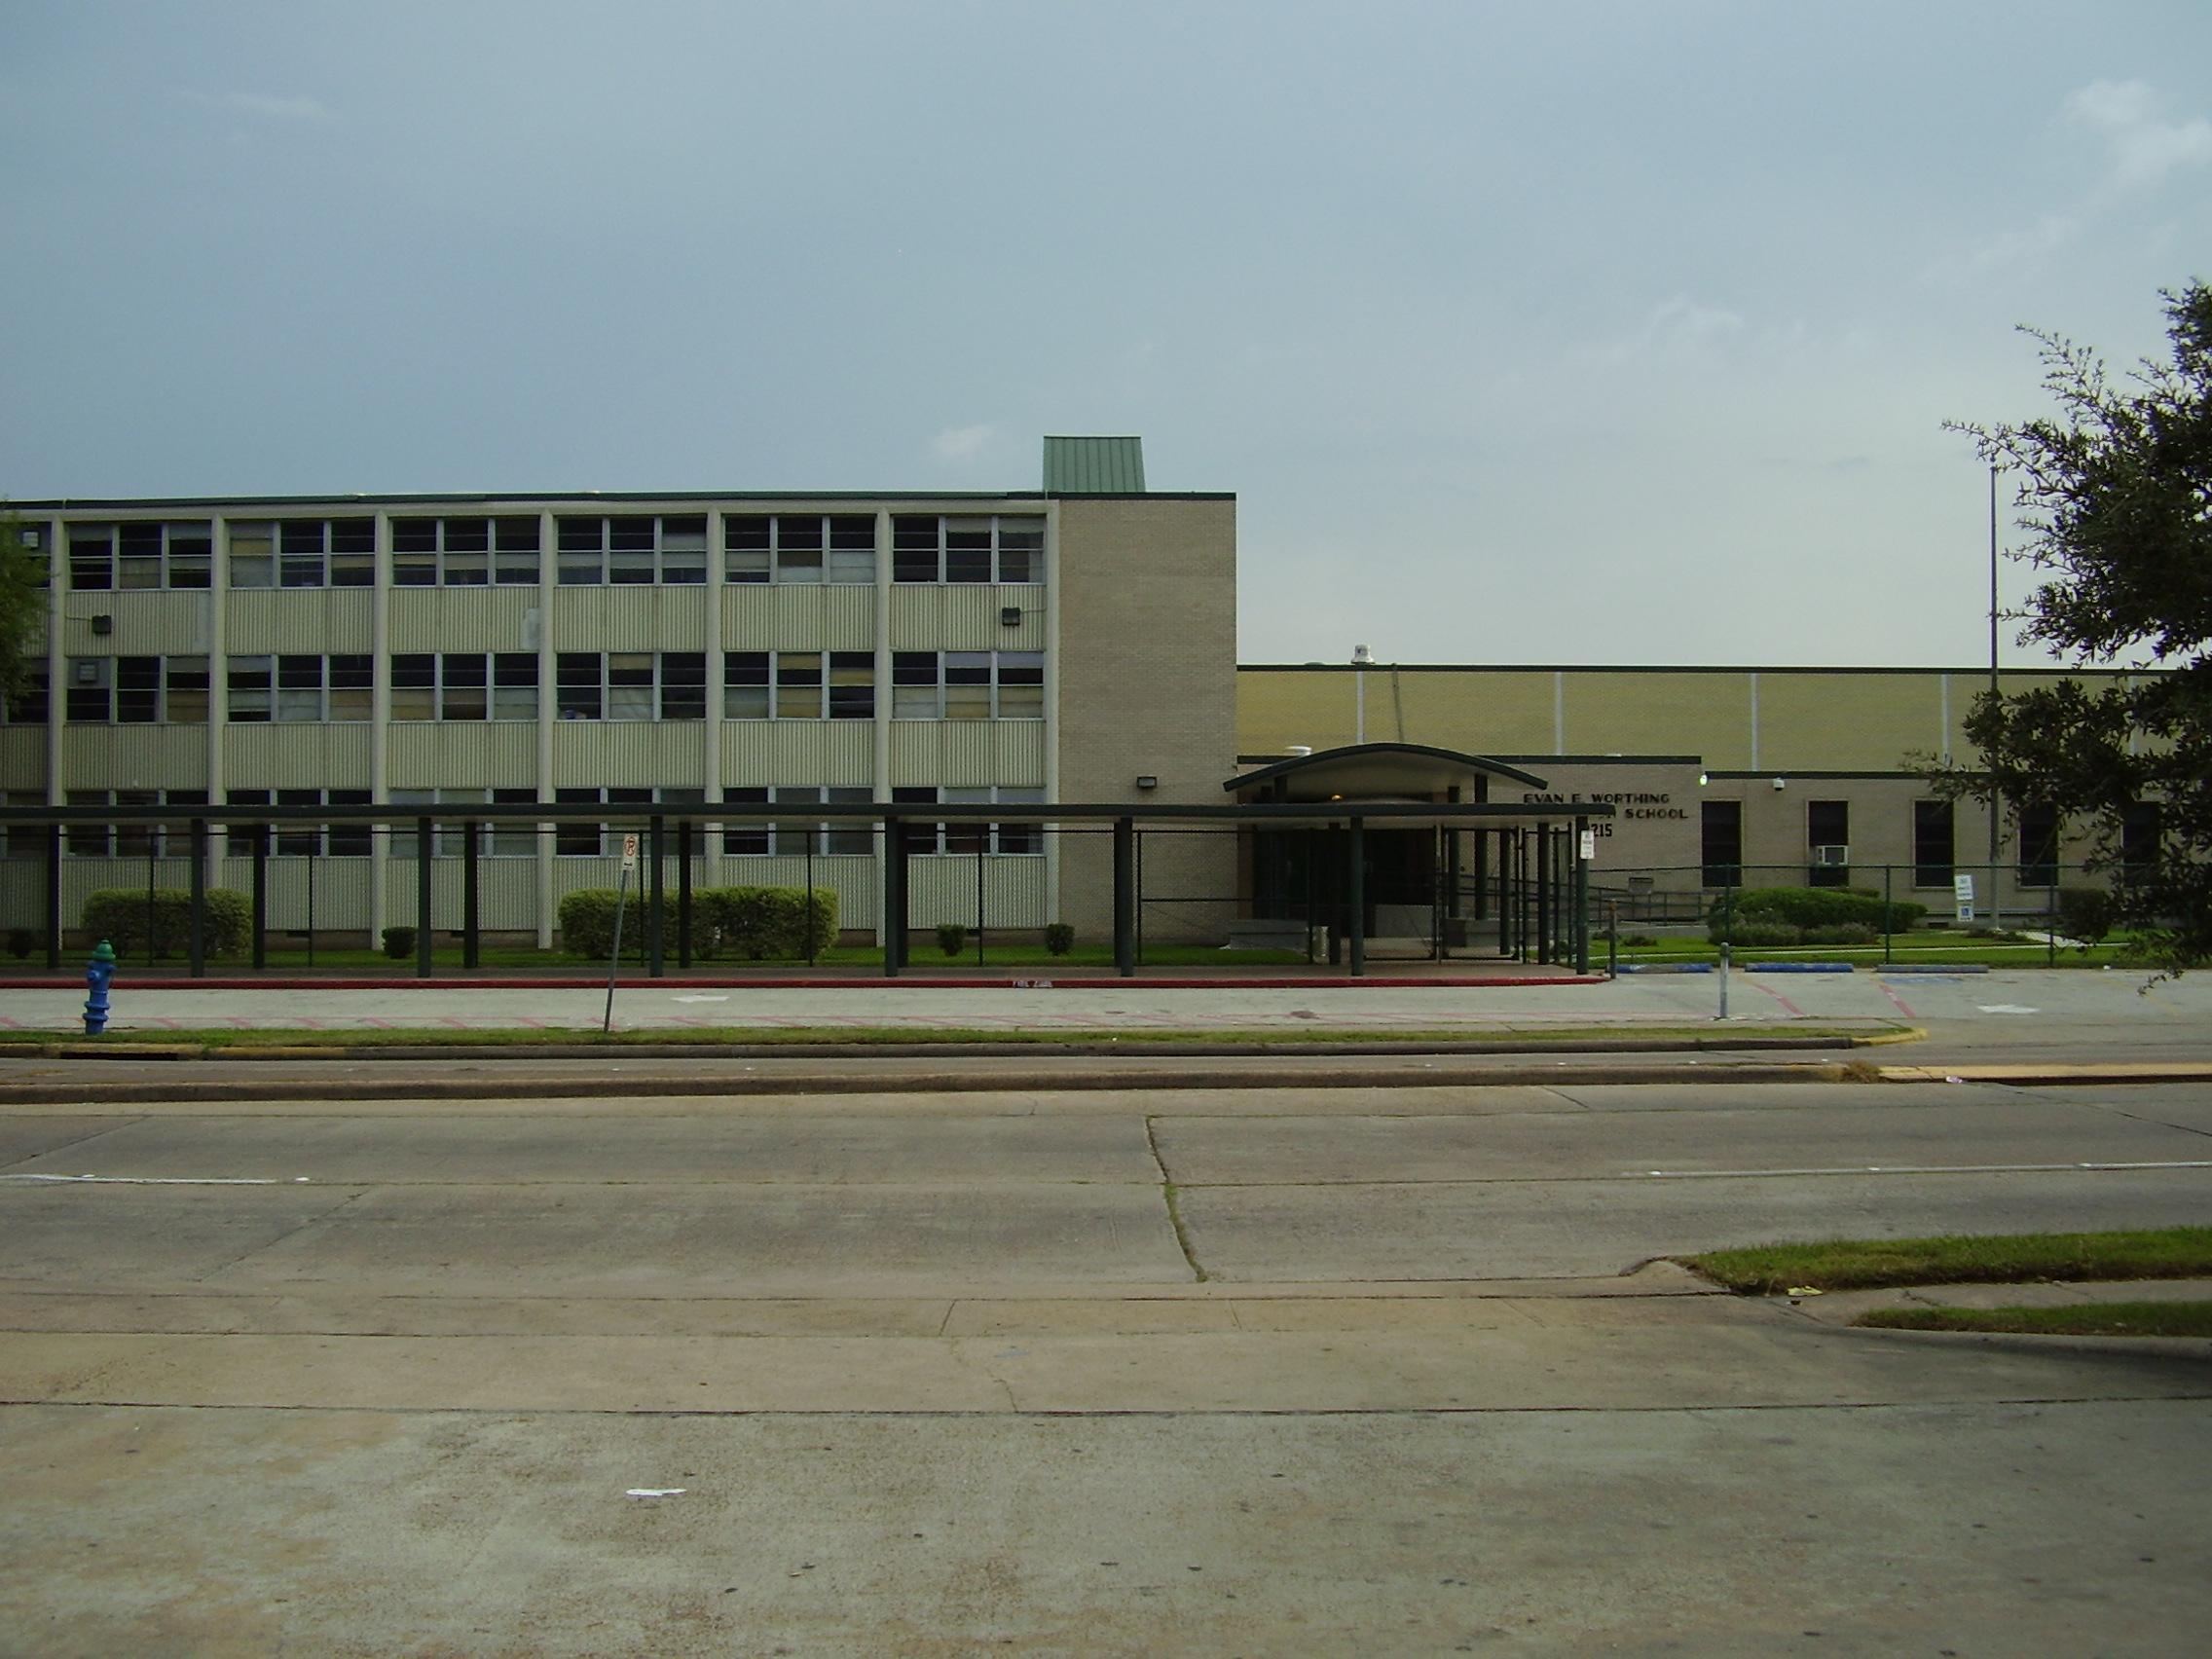 Worthing High School New Building